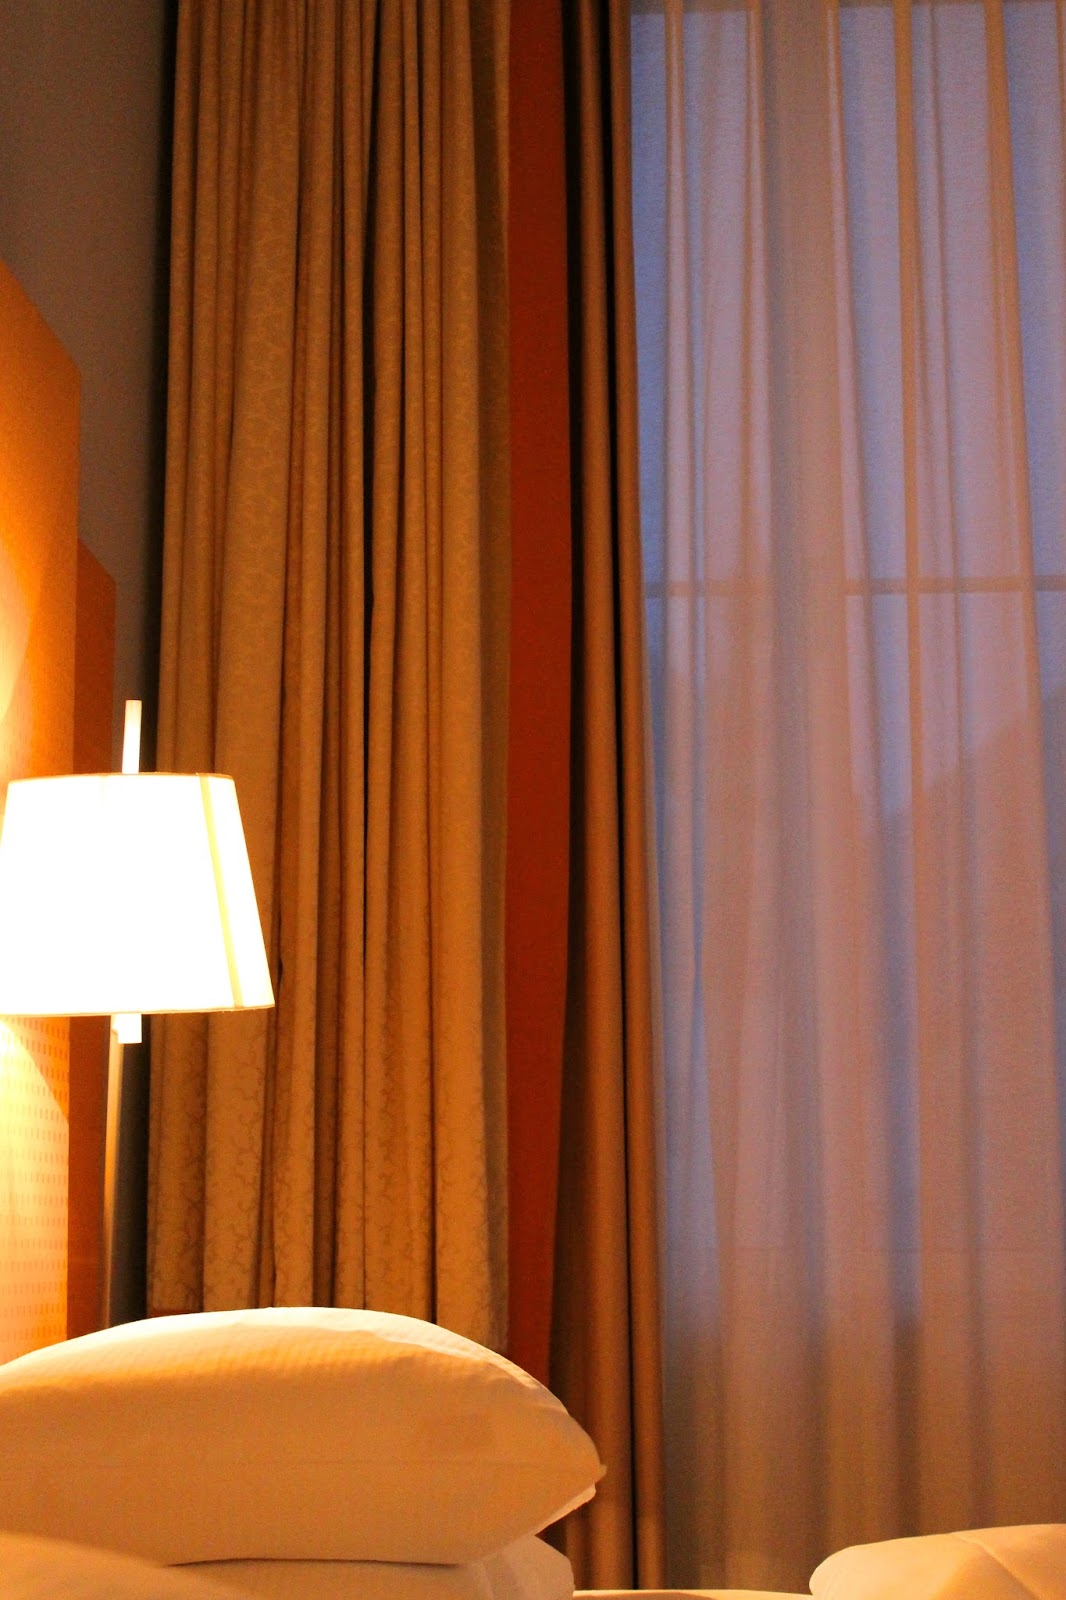 Hilton Hotel Germany